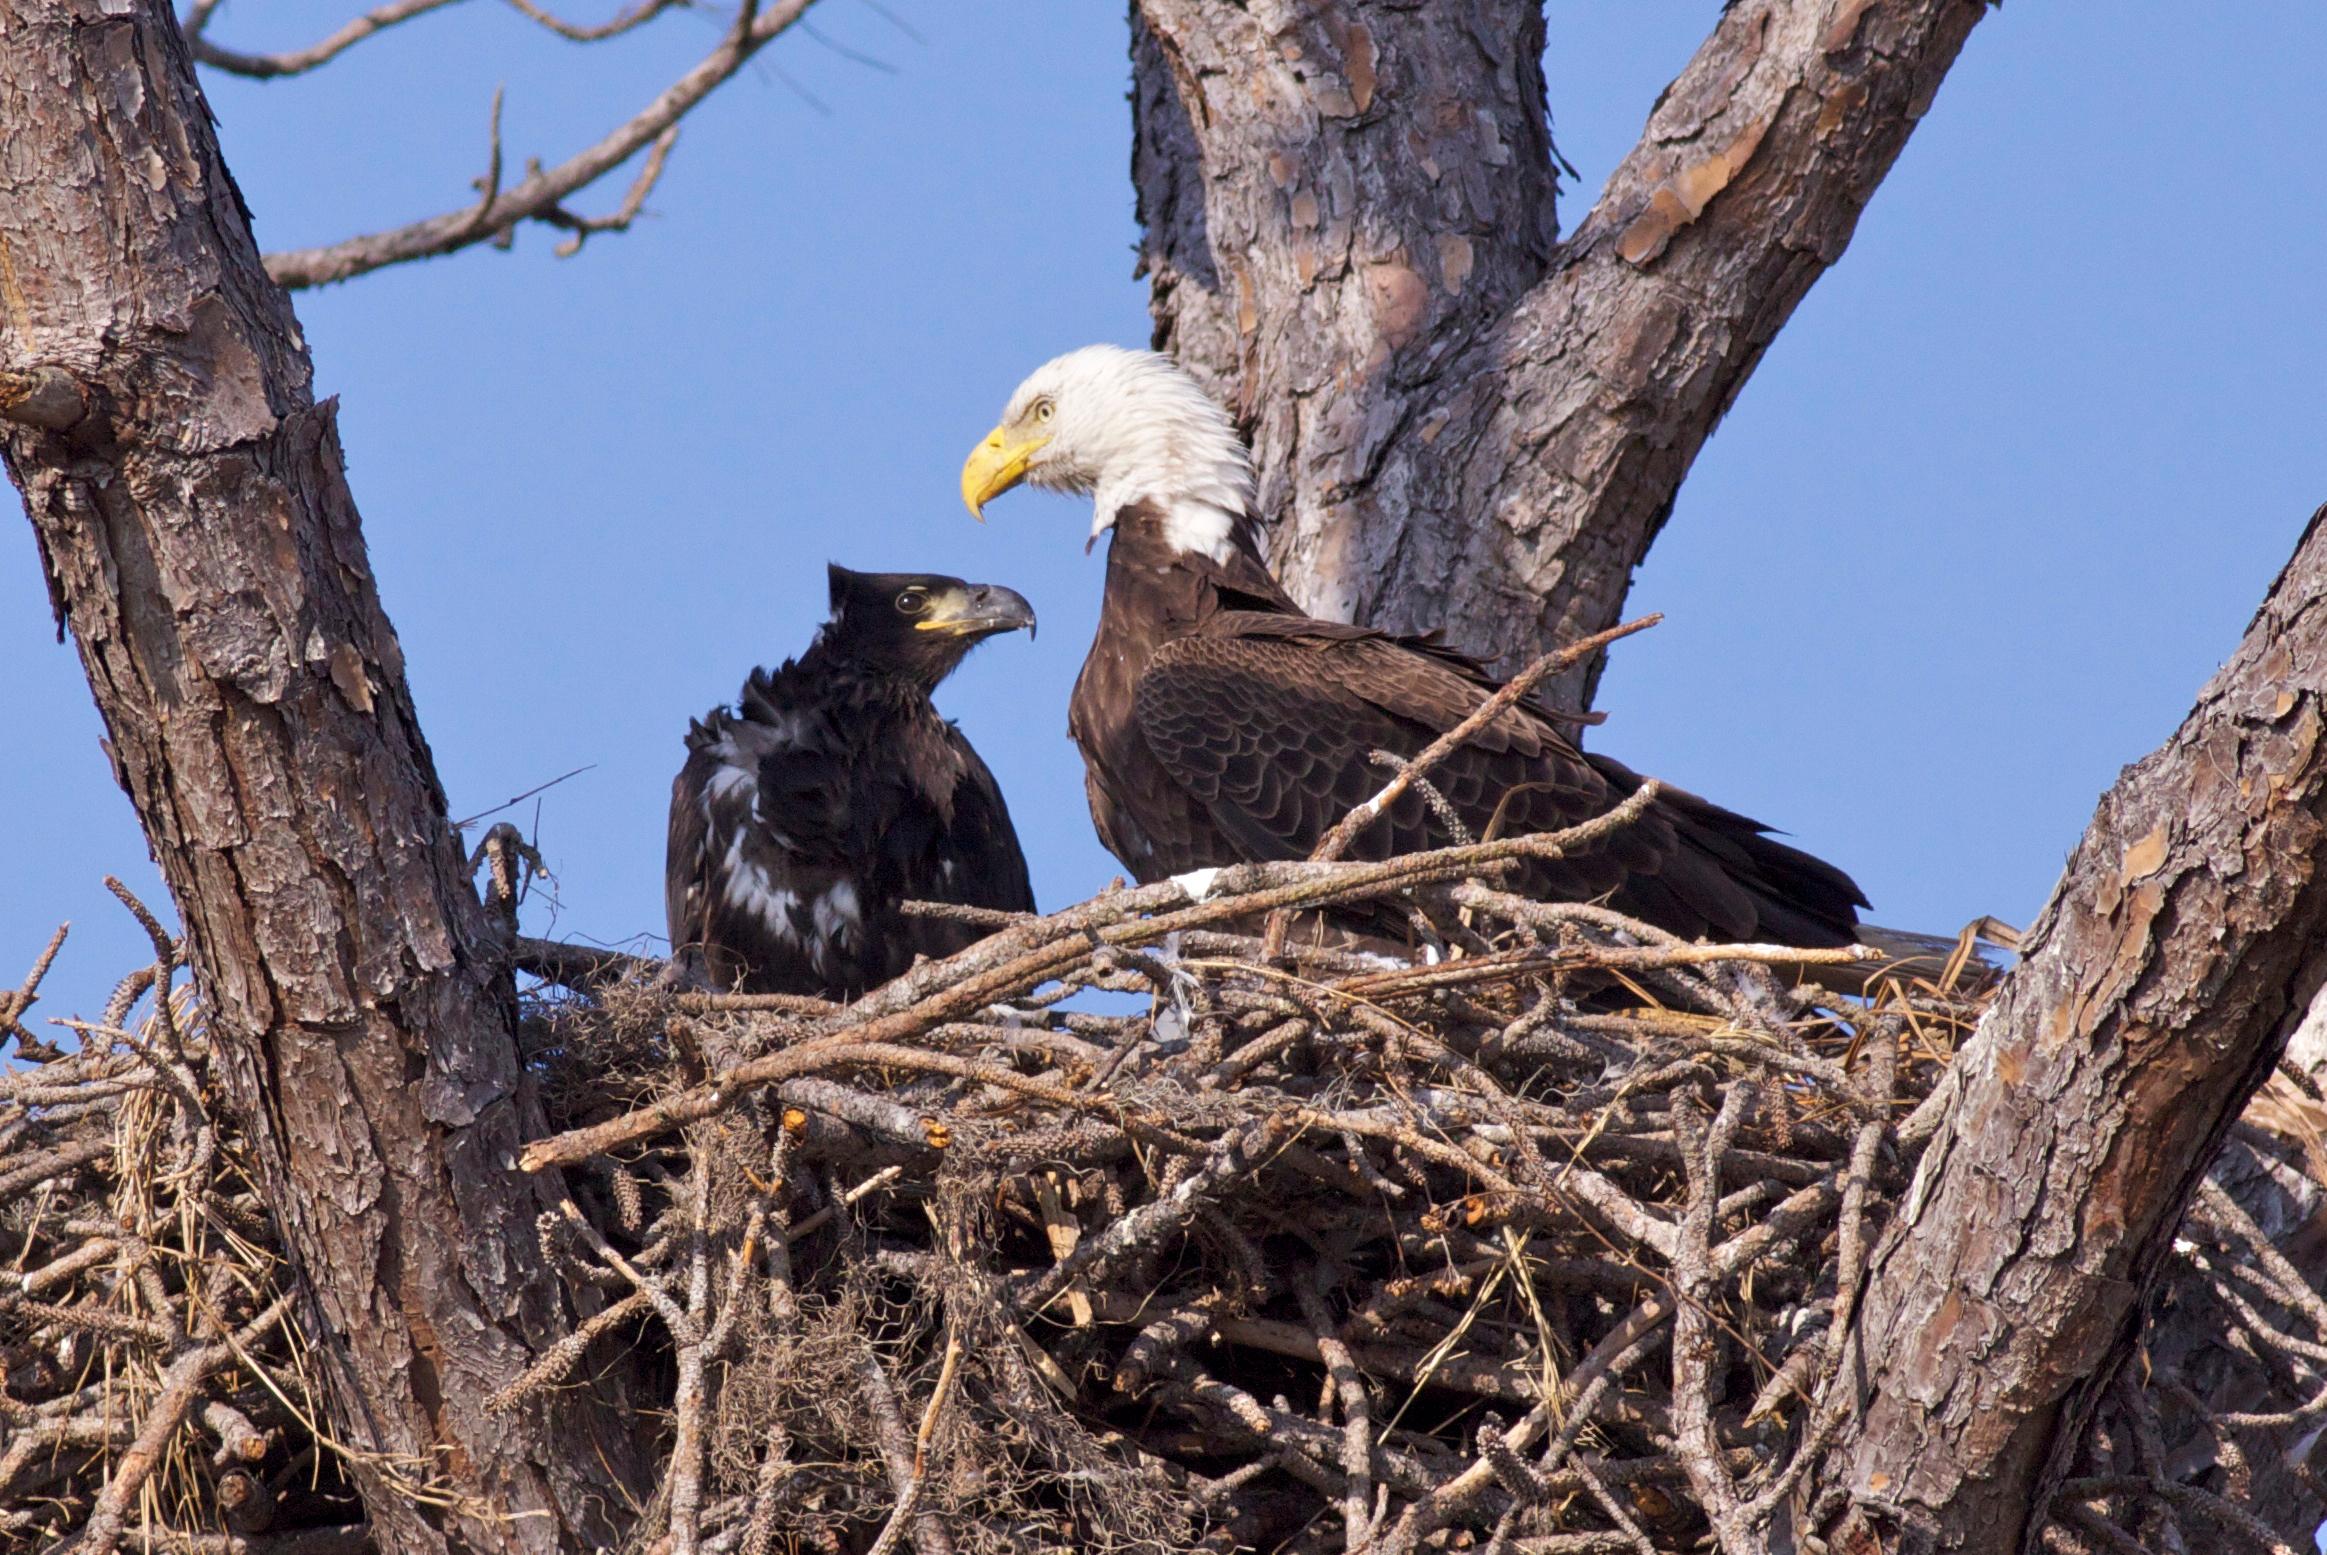 Bald eagle family in nest, photo by Arlene Koziol